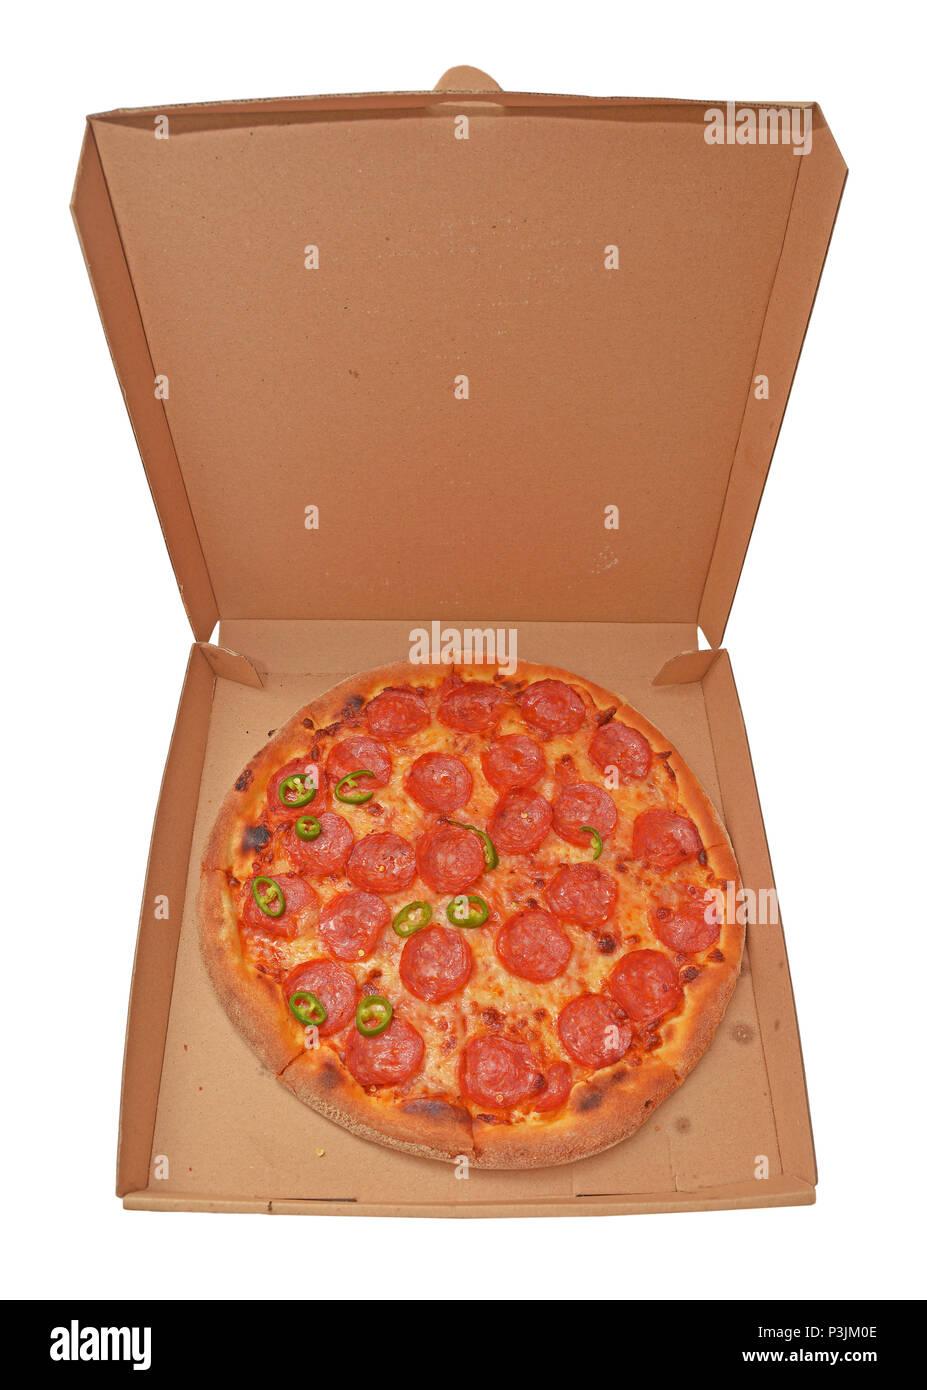 Pizza Salami In Cardboard Box Stock Photo 208779214 Alamy